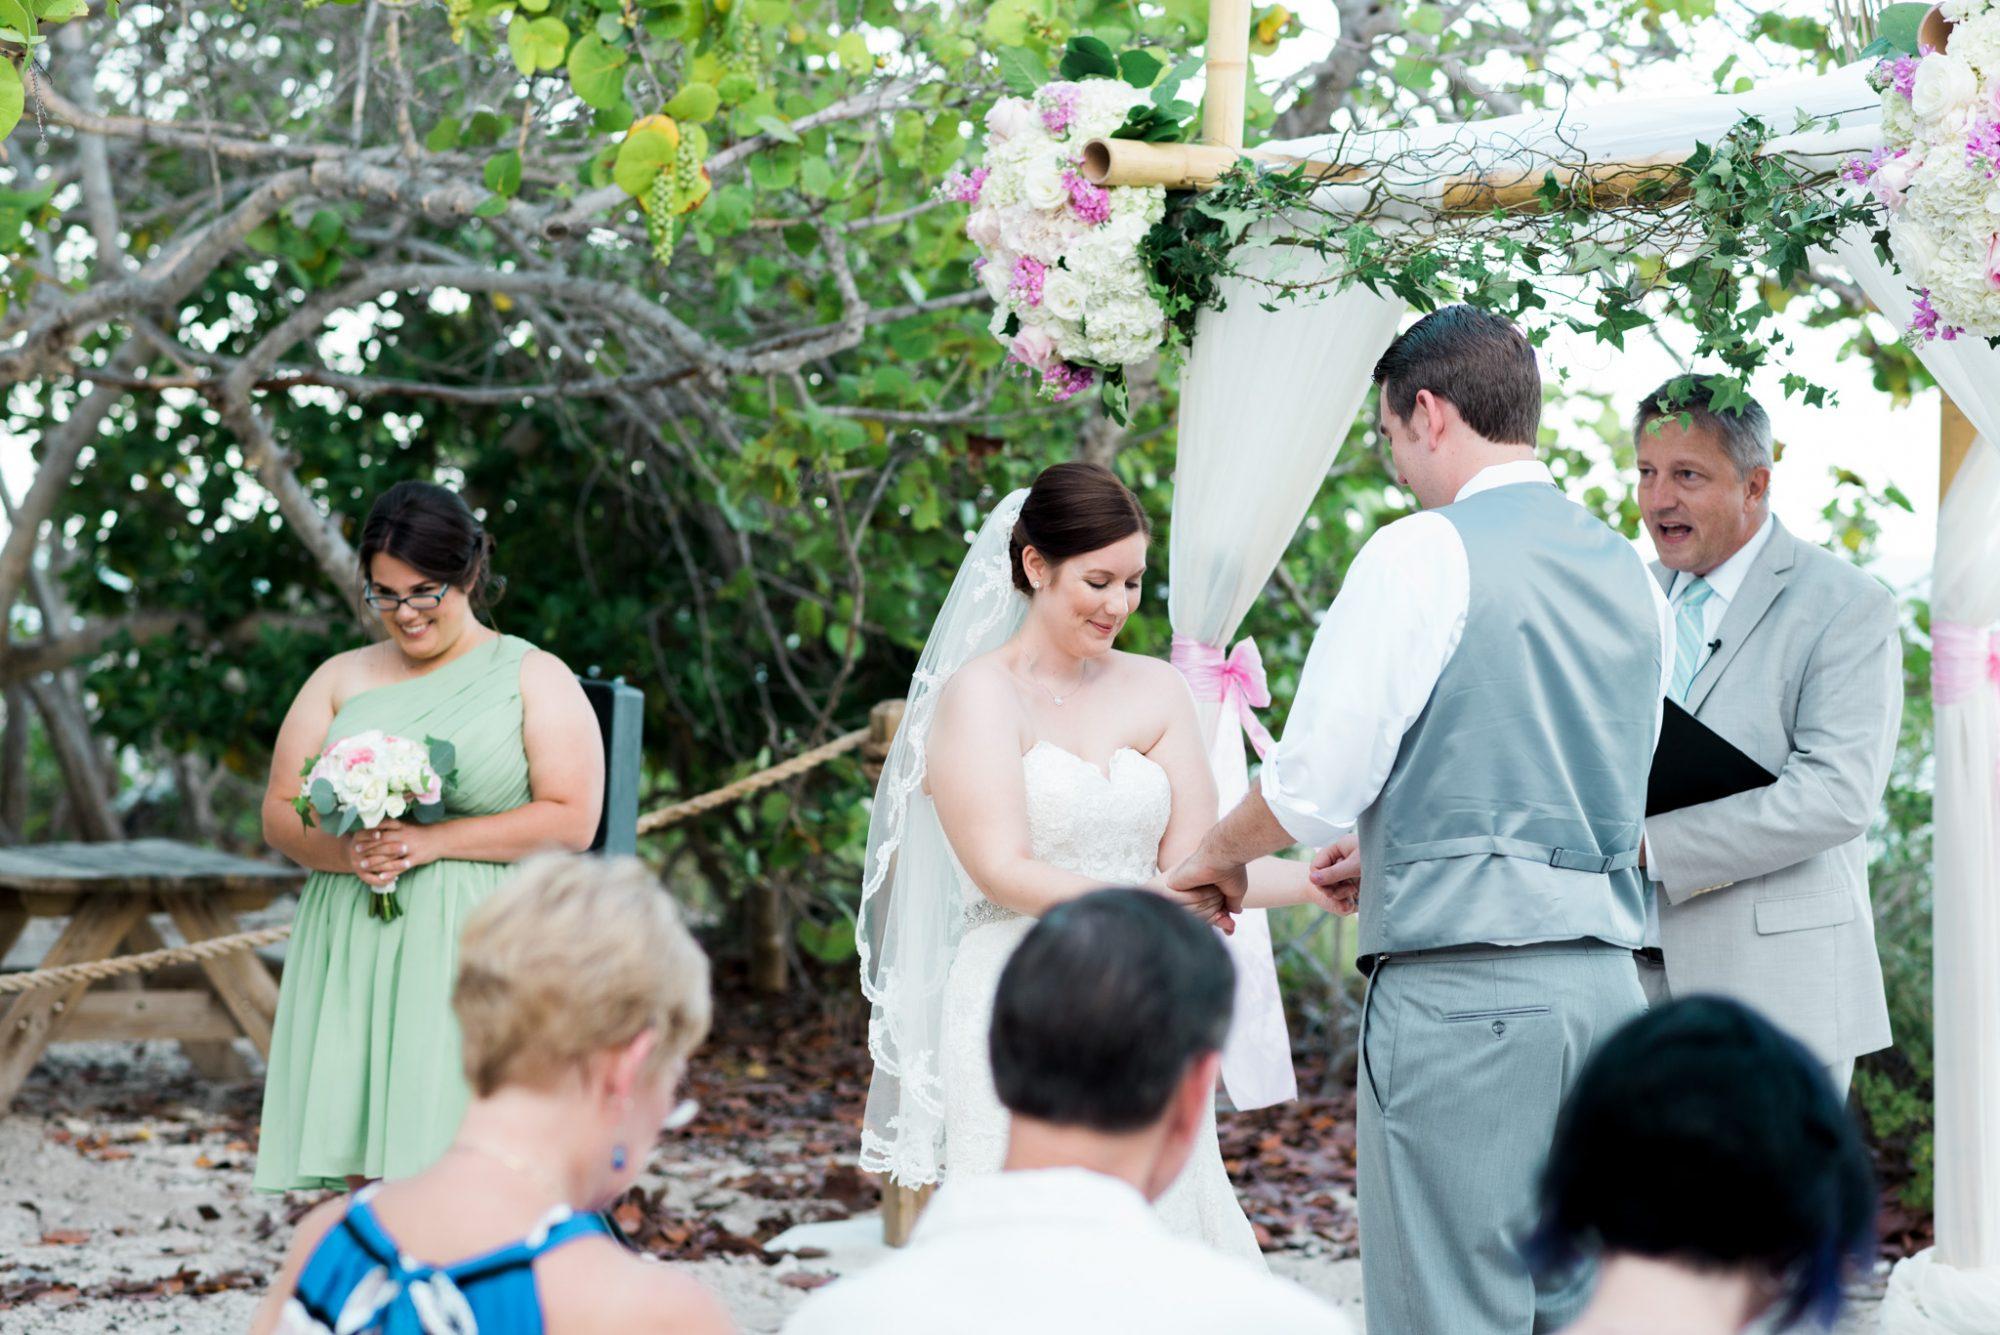 Heather Jeff Key West Wedding Photographer Fort Zachary Taylor 20 - Heather & Jeff - Key West Wedding Photographer - Fort Zachary Taylor